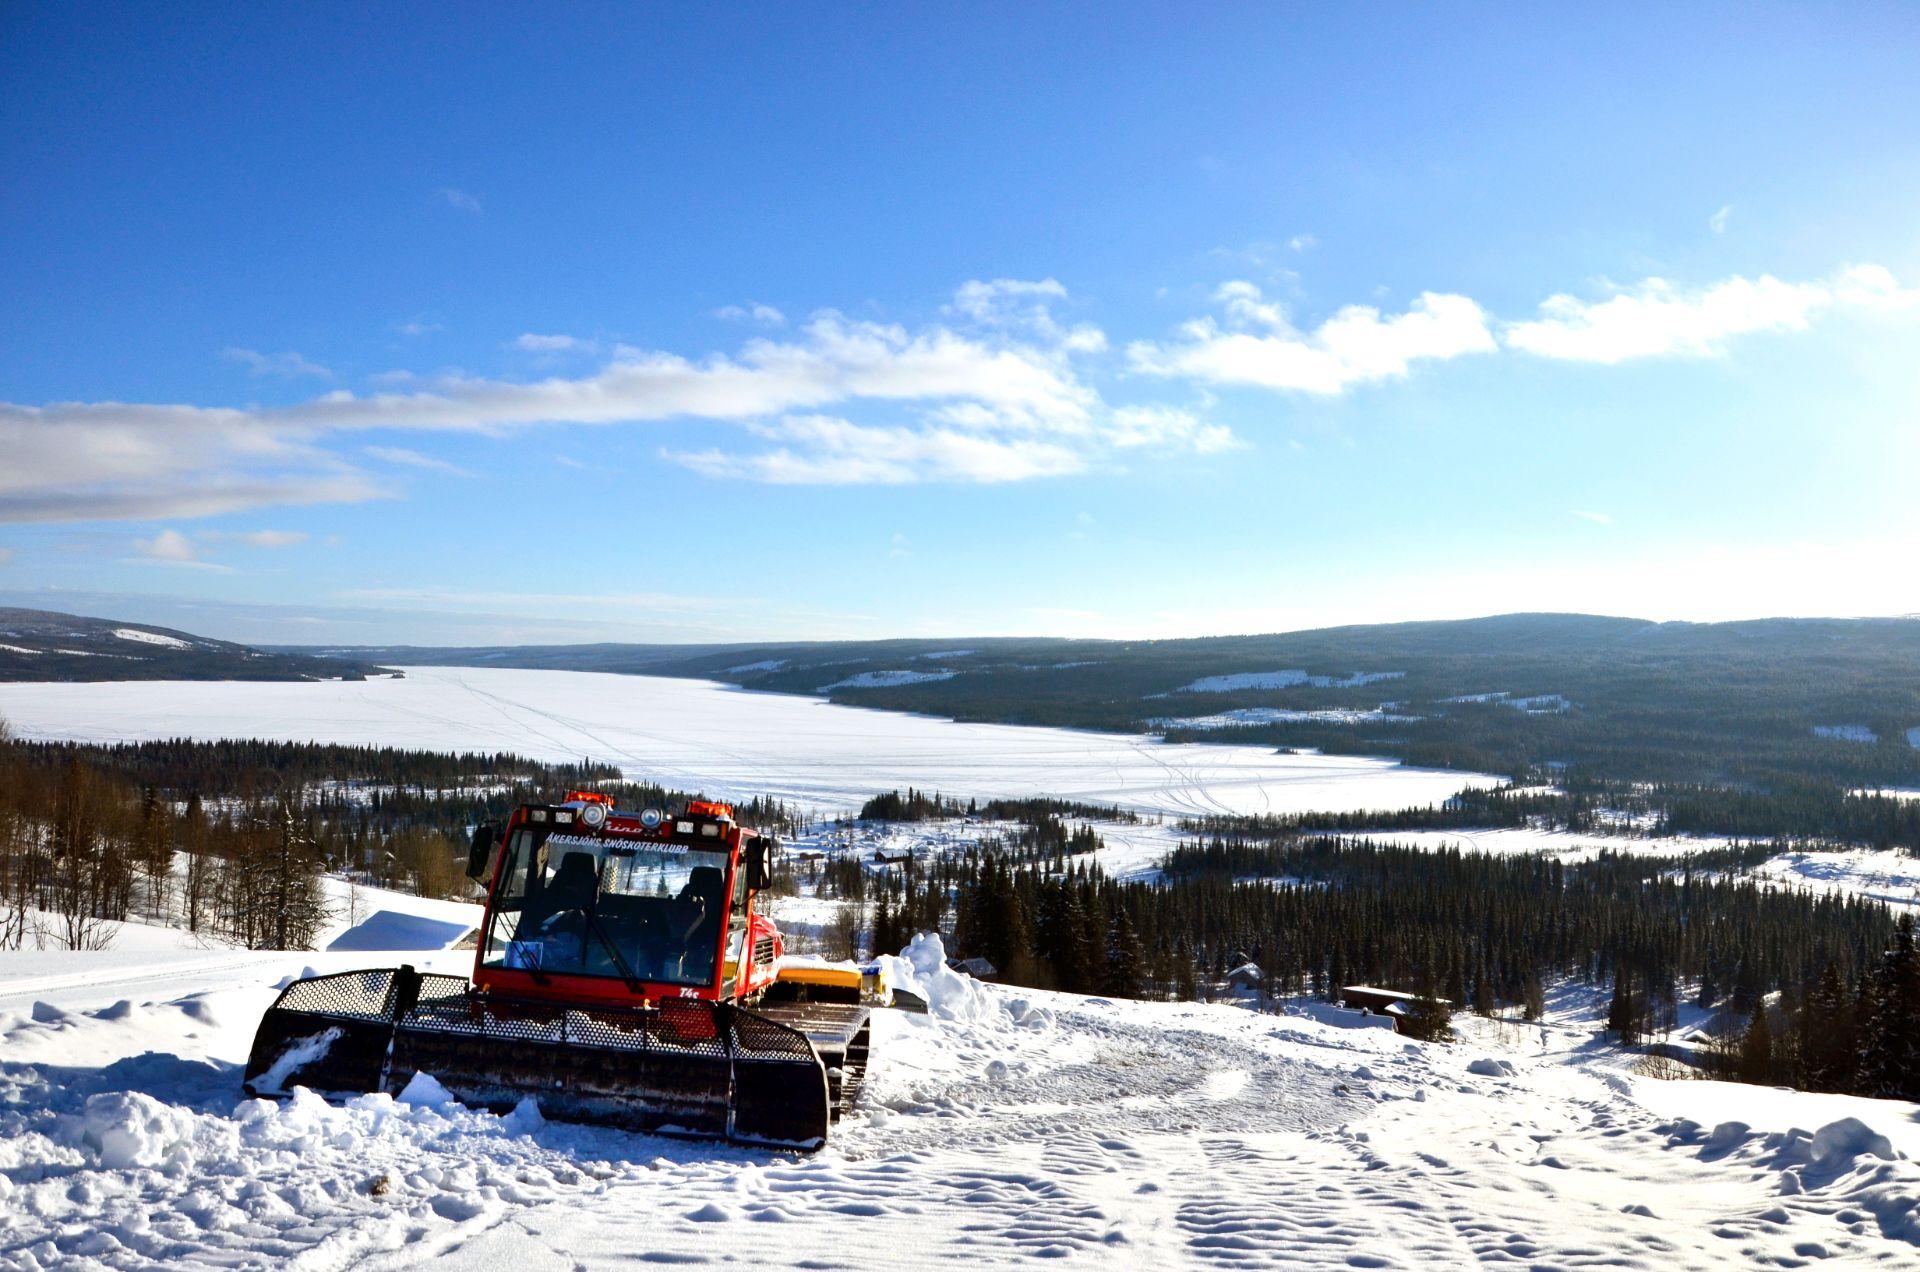 Snöskoterklubbs pistmaskin. Foto © Isabell Lundli.